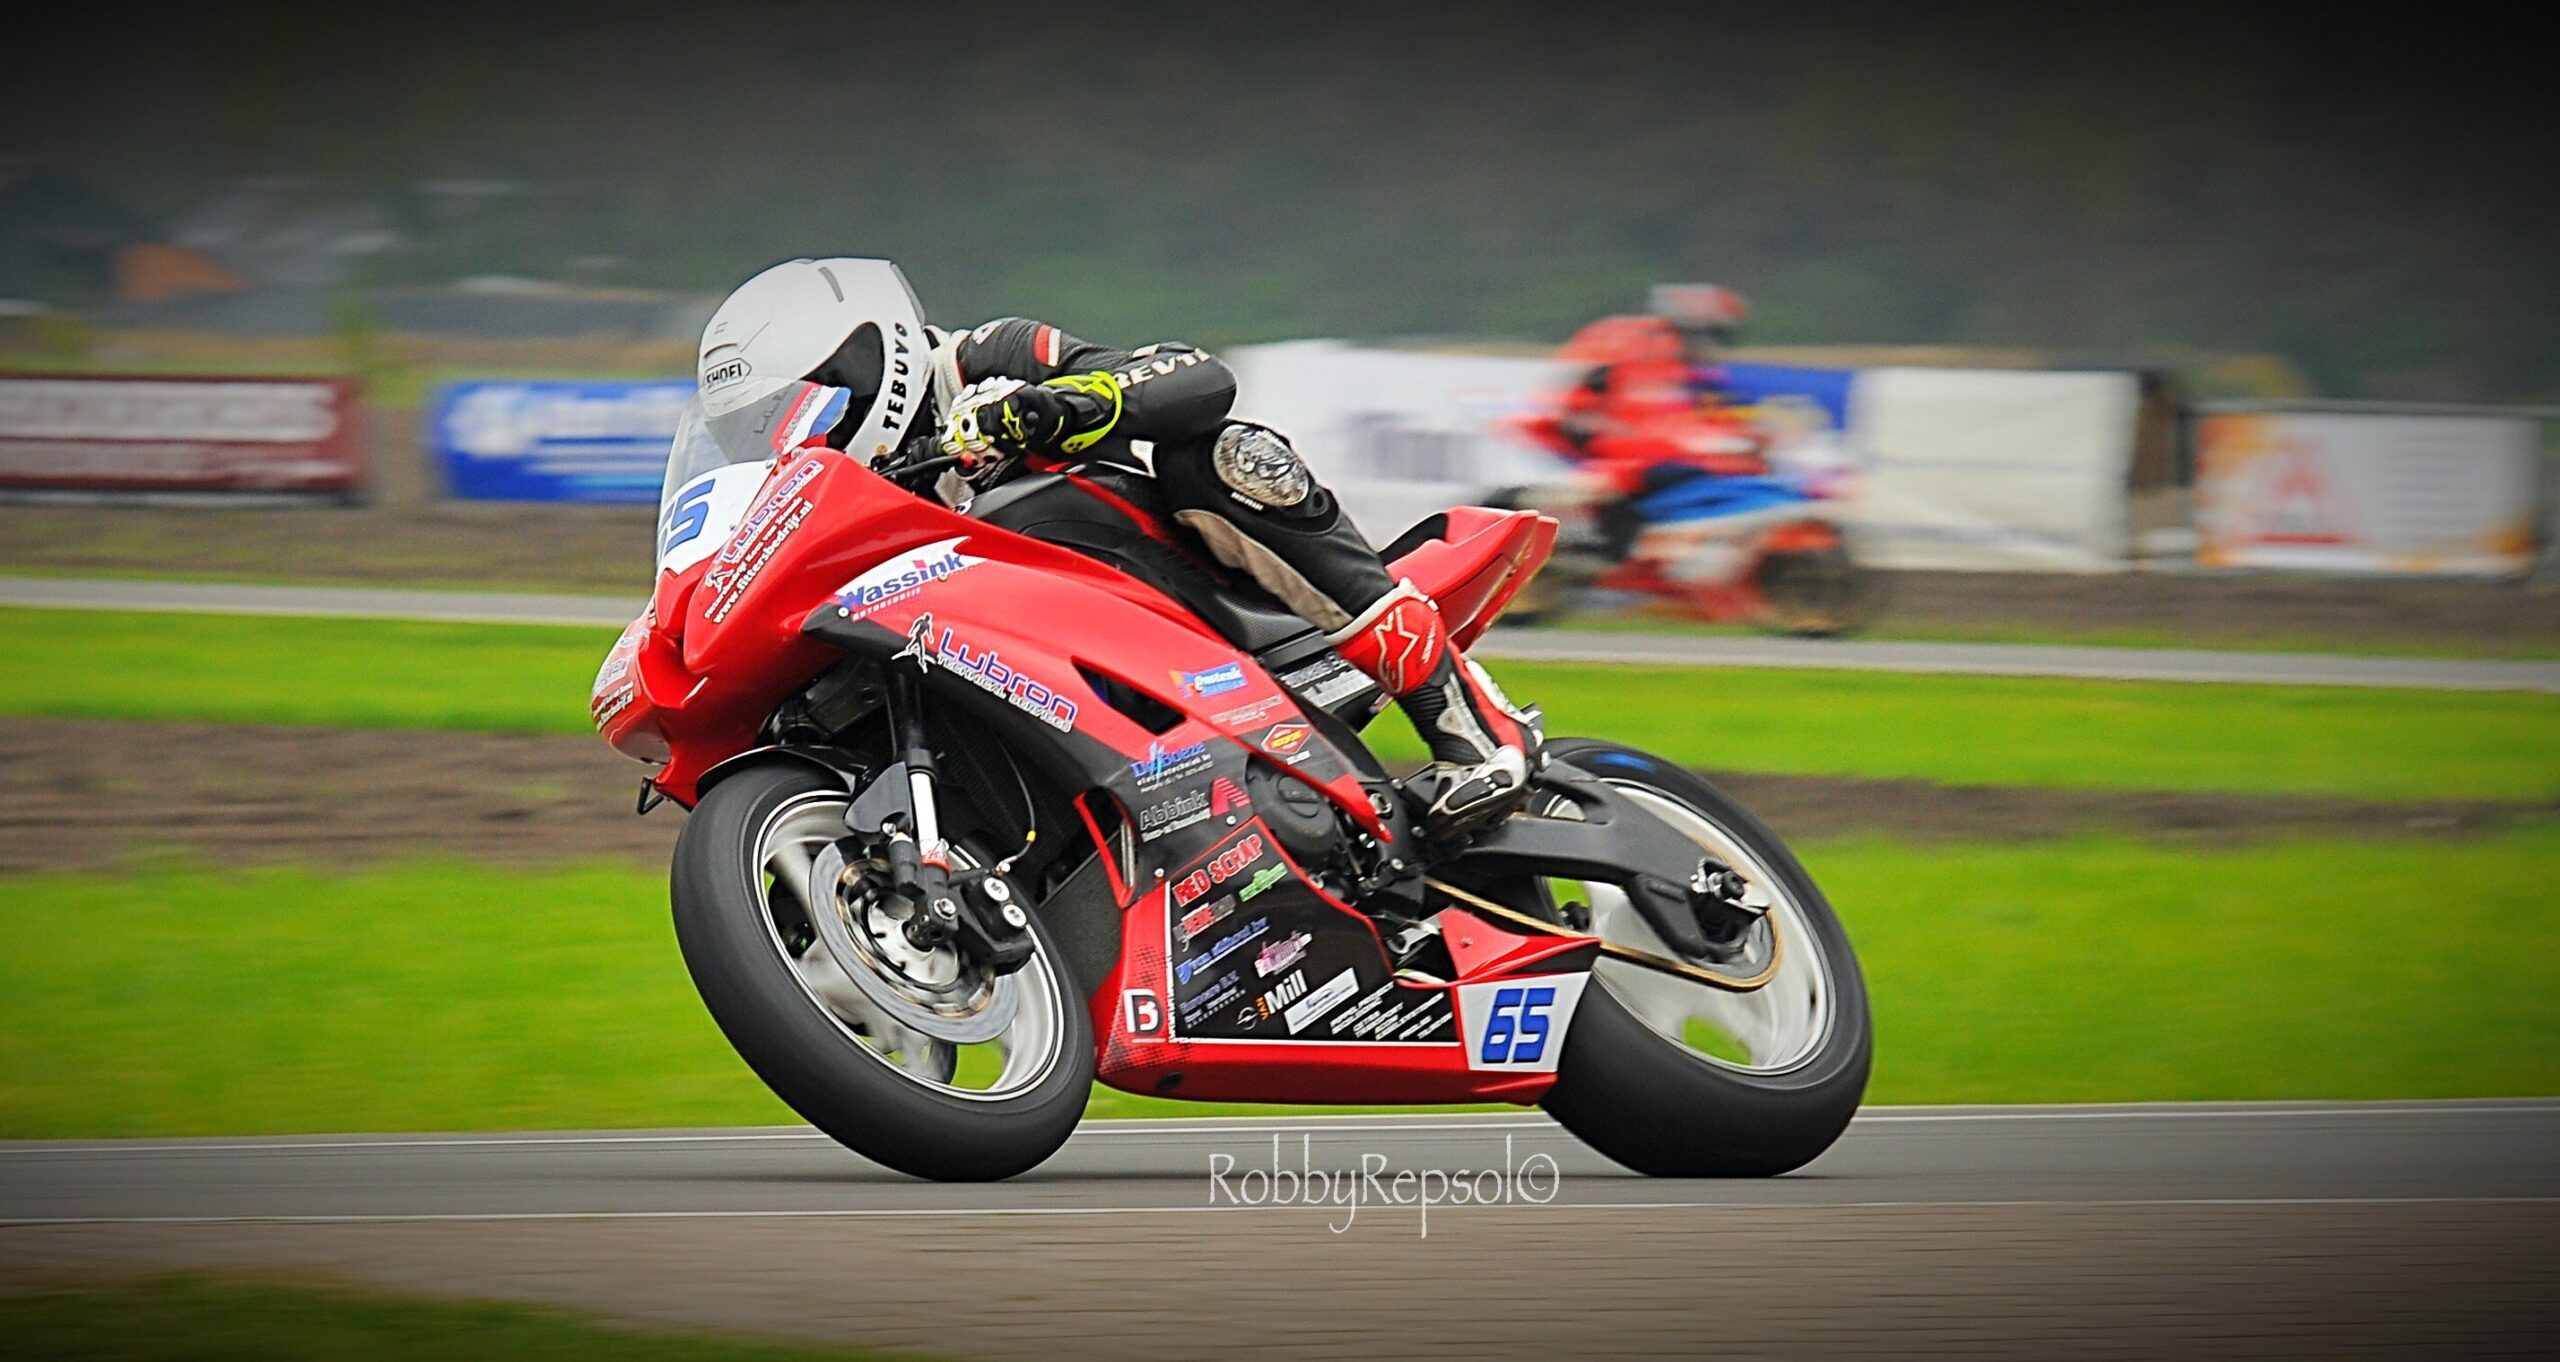 IRRC Supersport Champion Den Besten Announces Superbike Step Up With Performance Racing Achterhoek